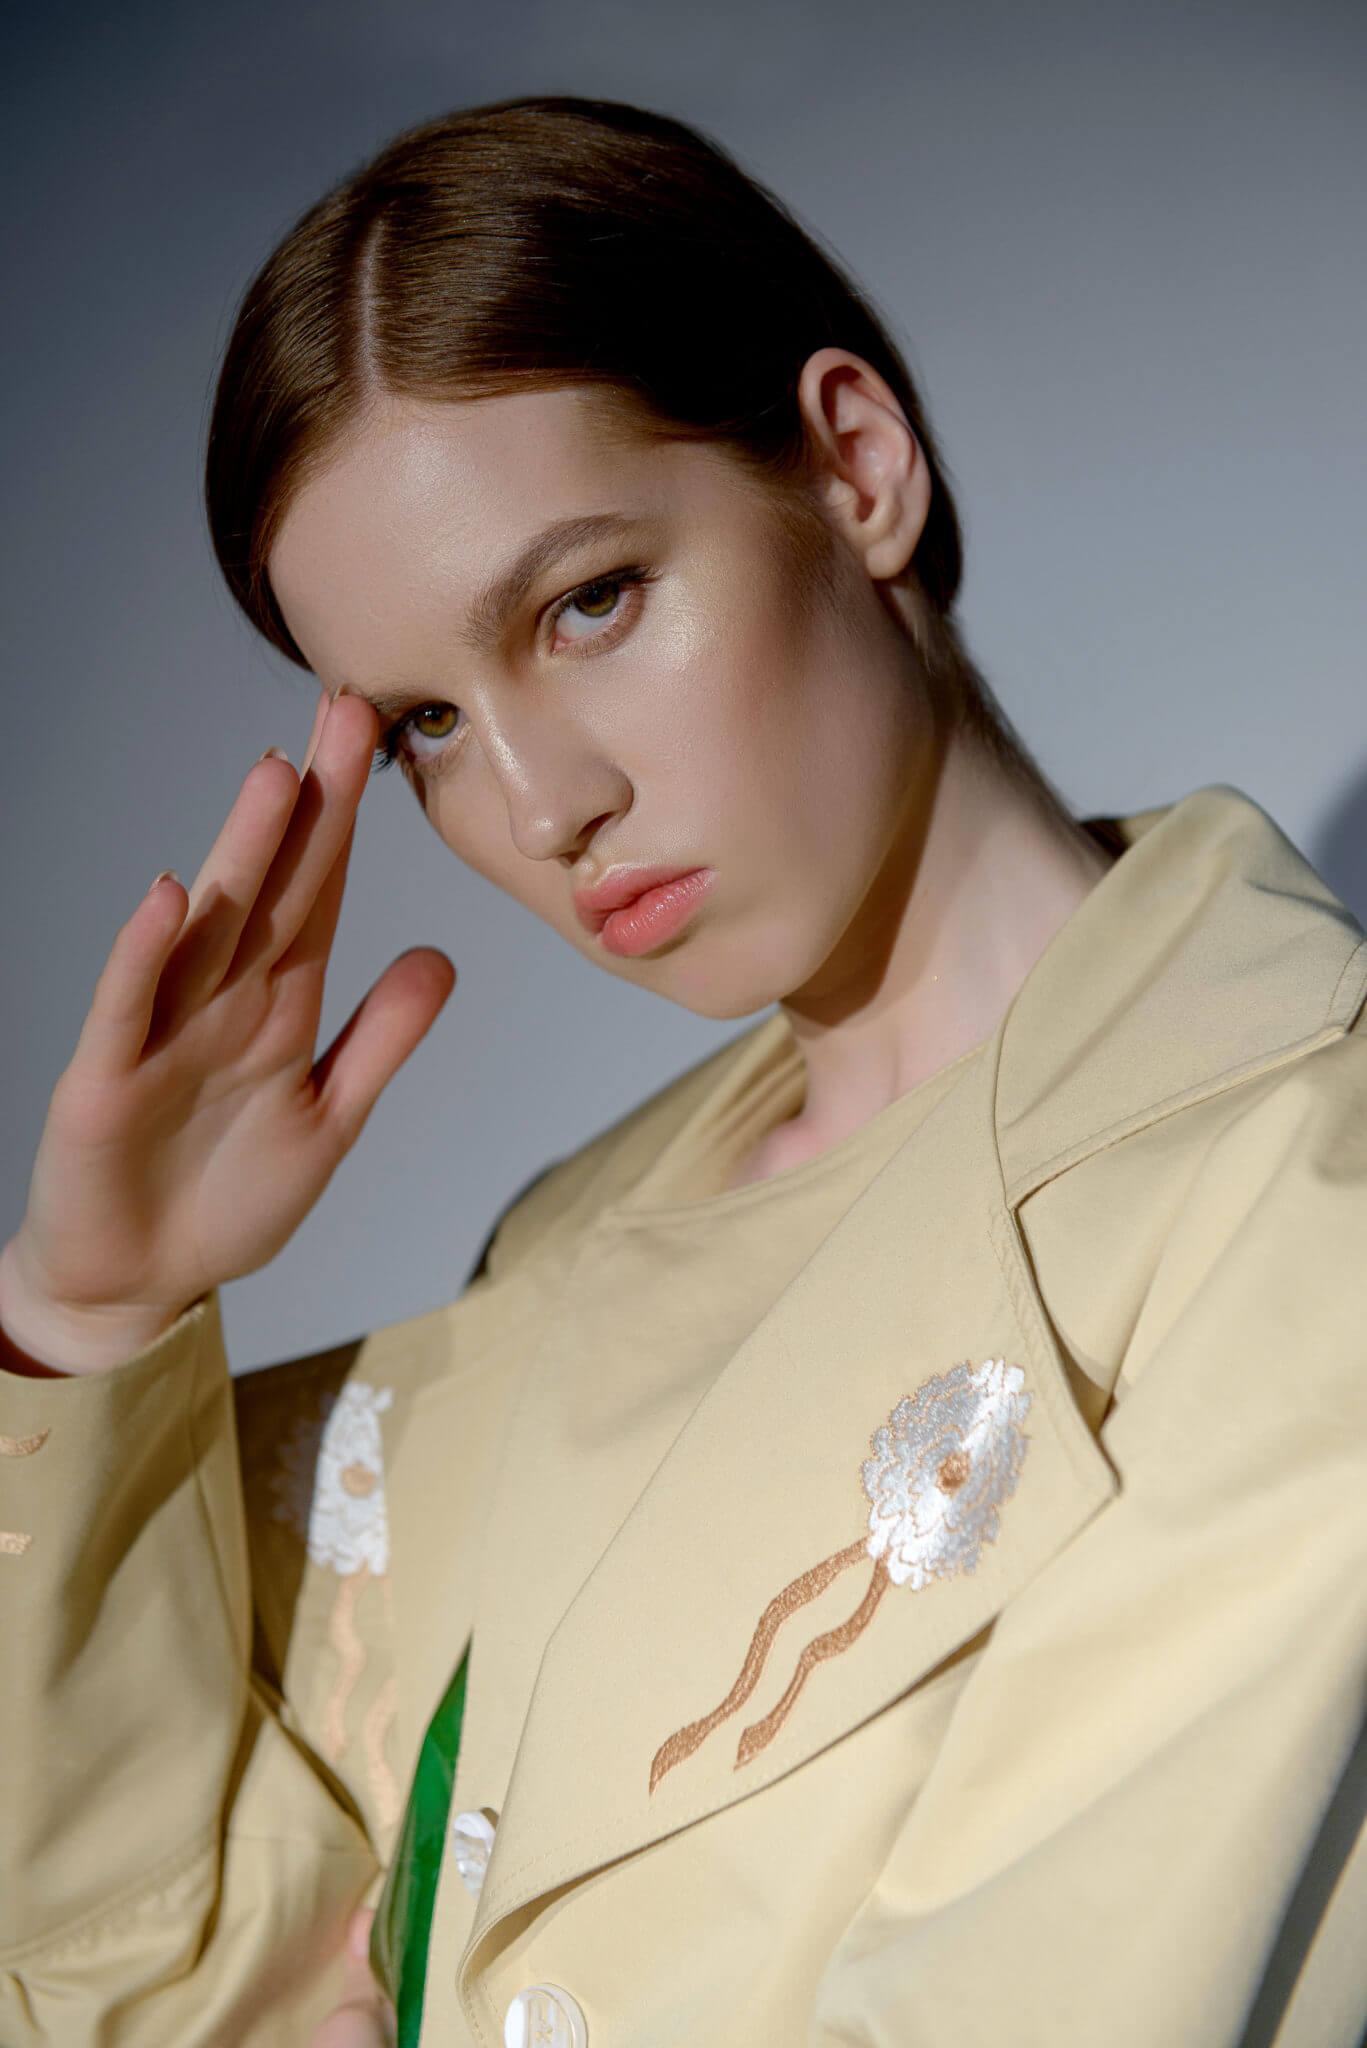 Рекламная съемка для бренда Darja Donezz. Ph Постникова, md Нана Речко. Девушка в песочном пиджаке на белом фоне